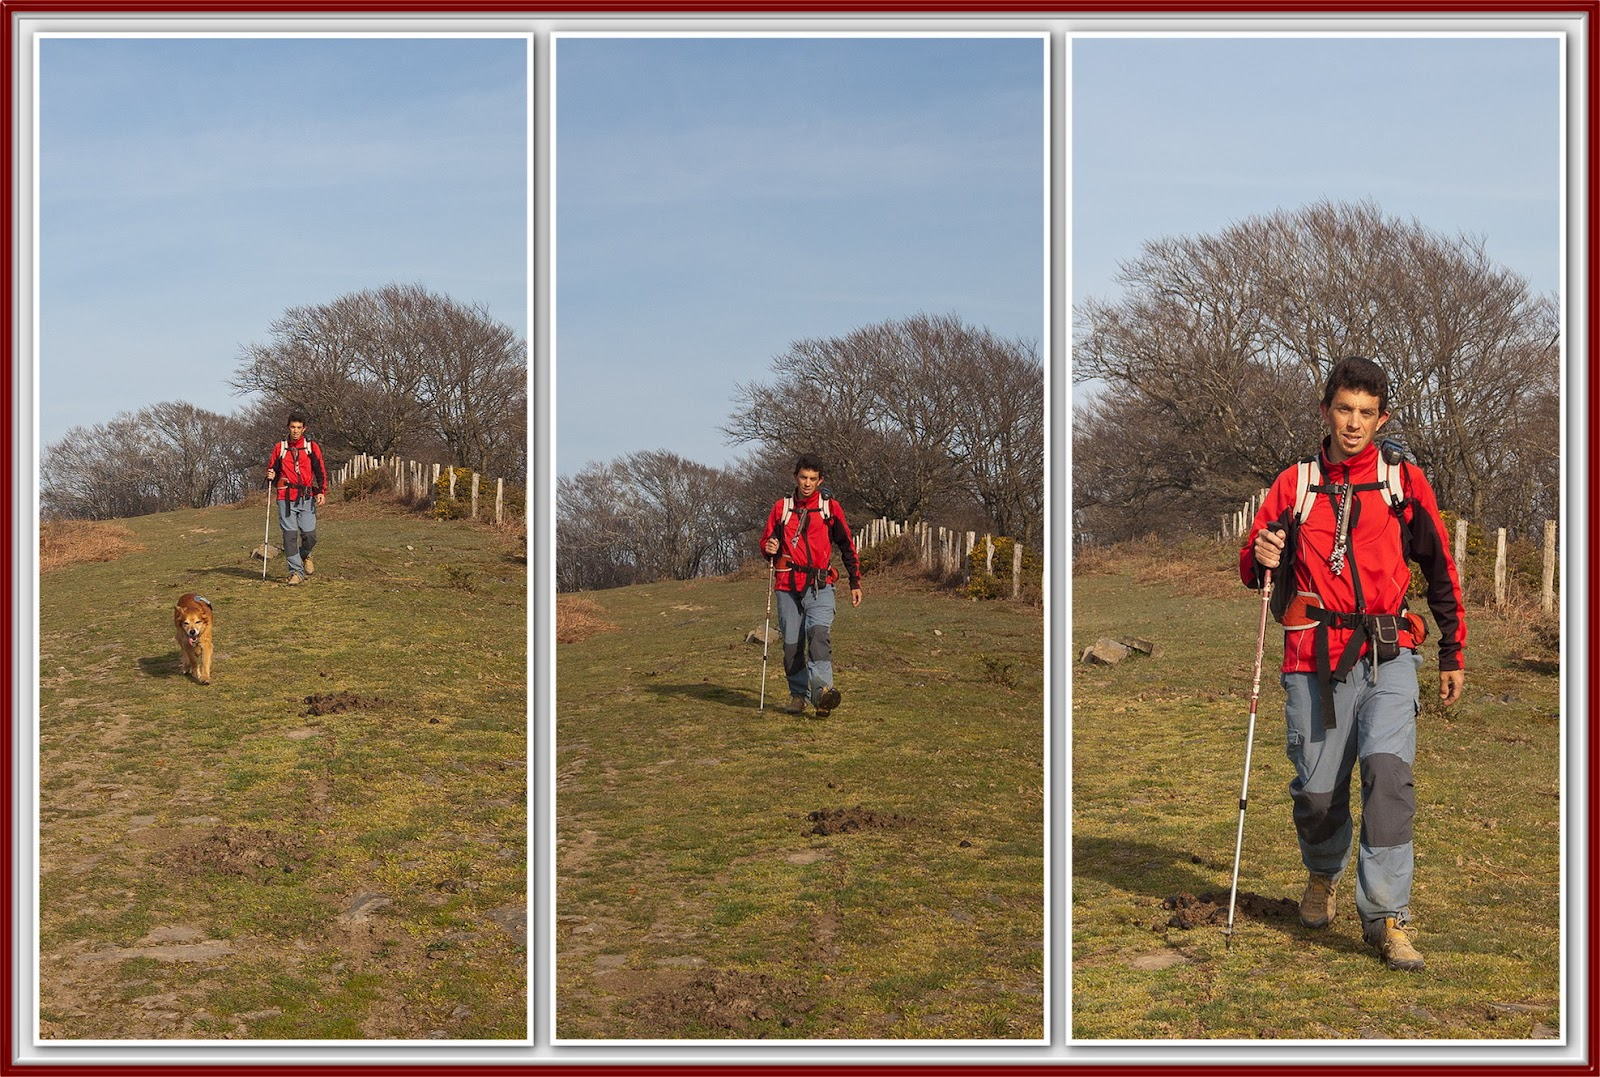 La senda agradecida: un paseo por arlaban. galbarrain troke usokoaitza